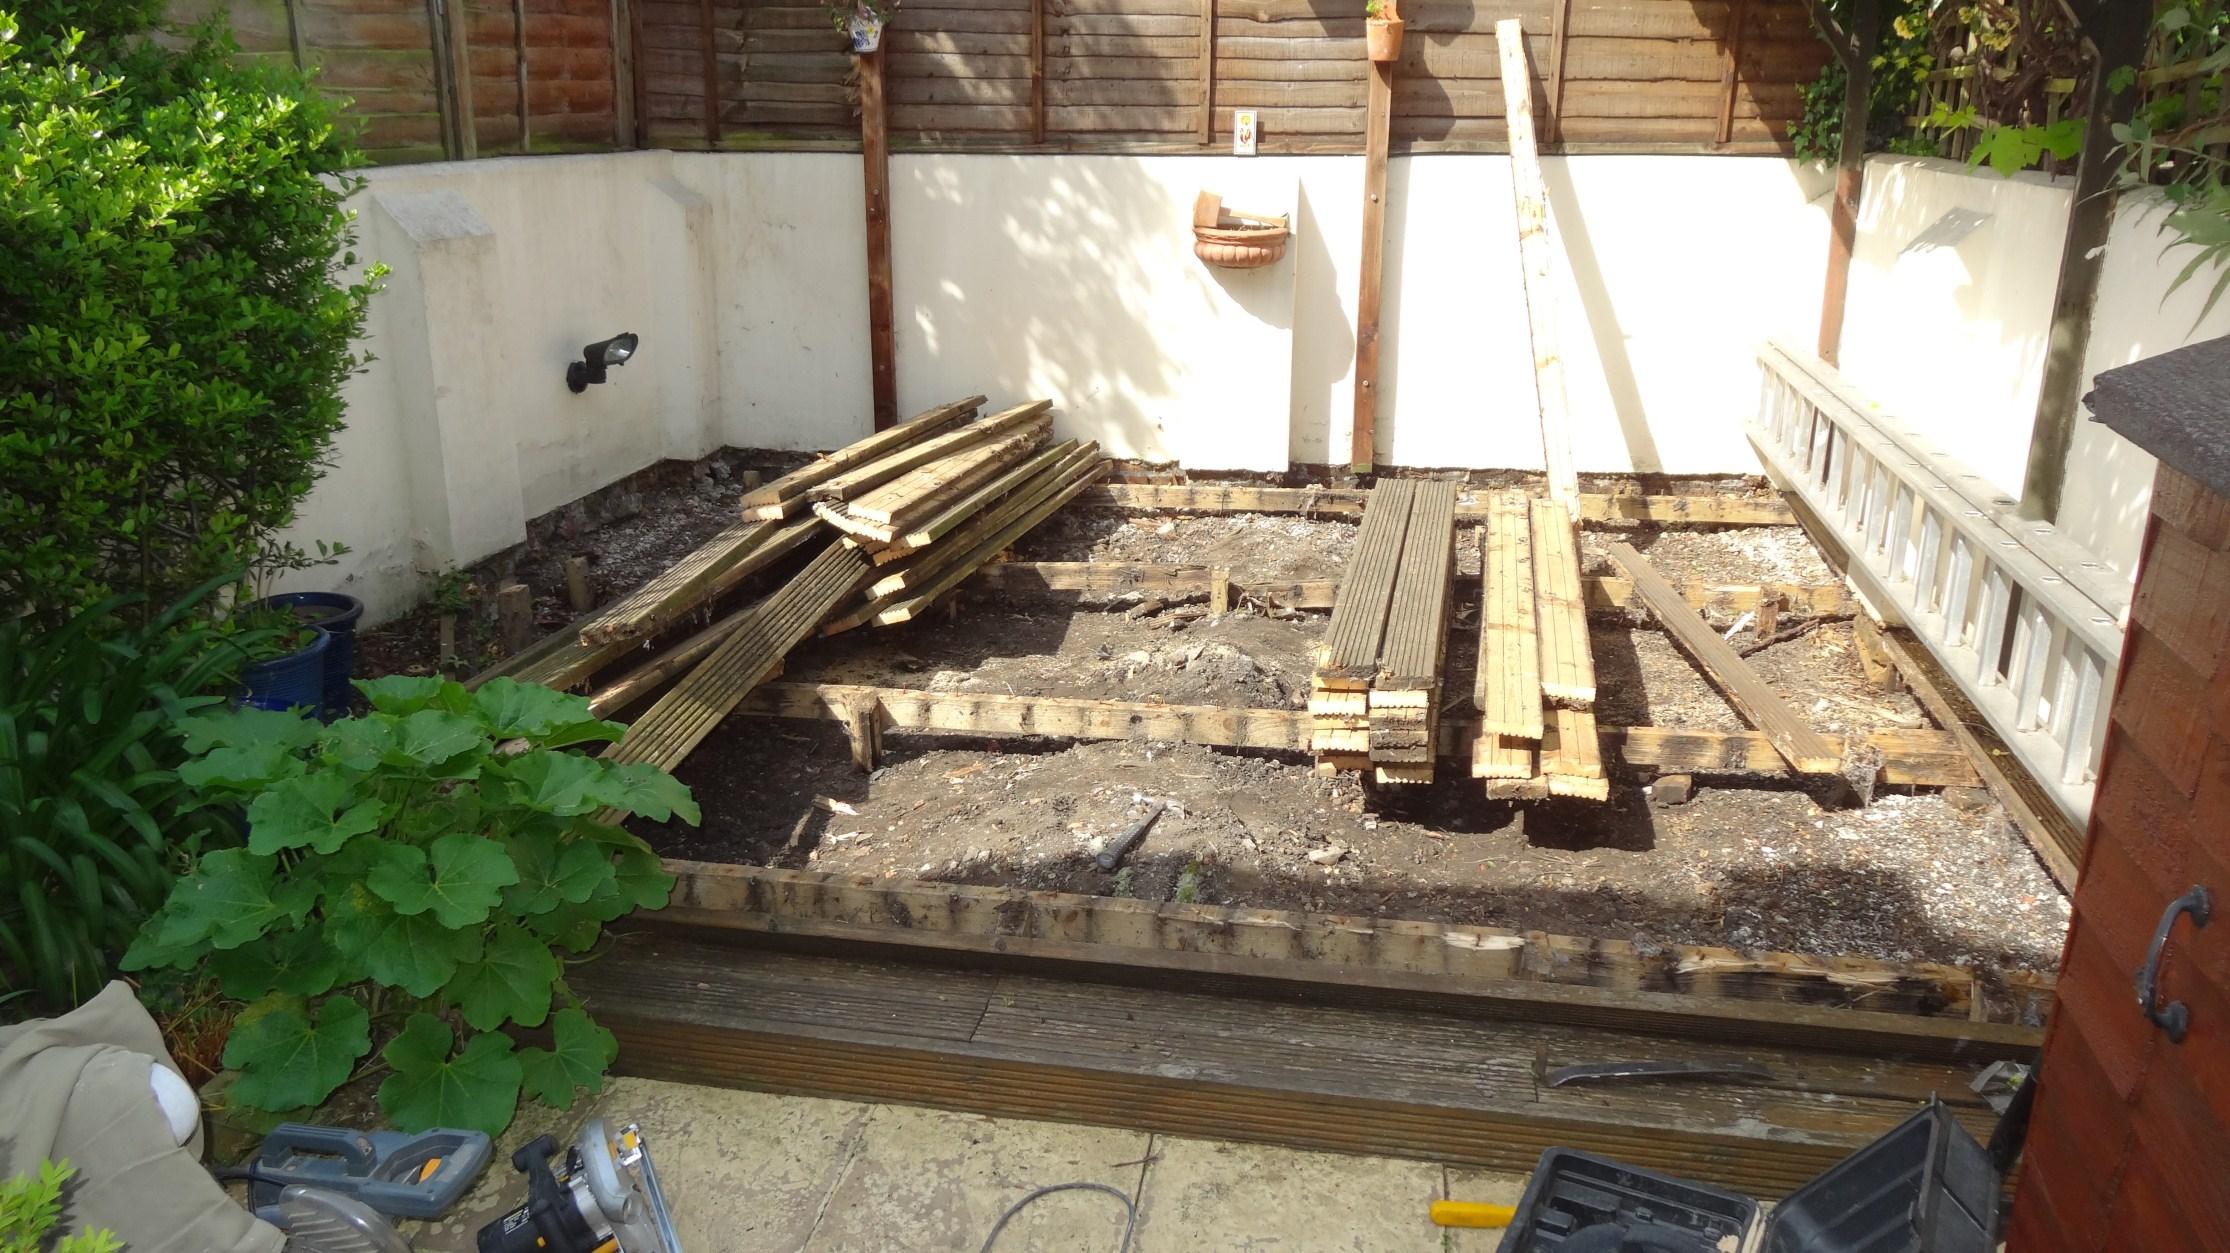 Installing new garden patio London